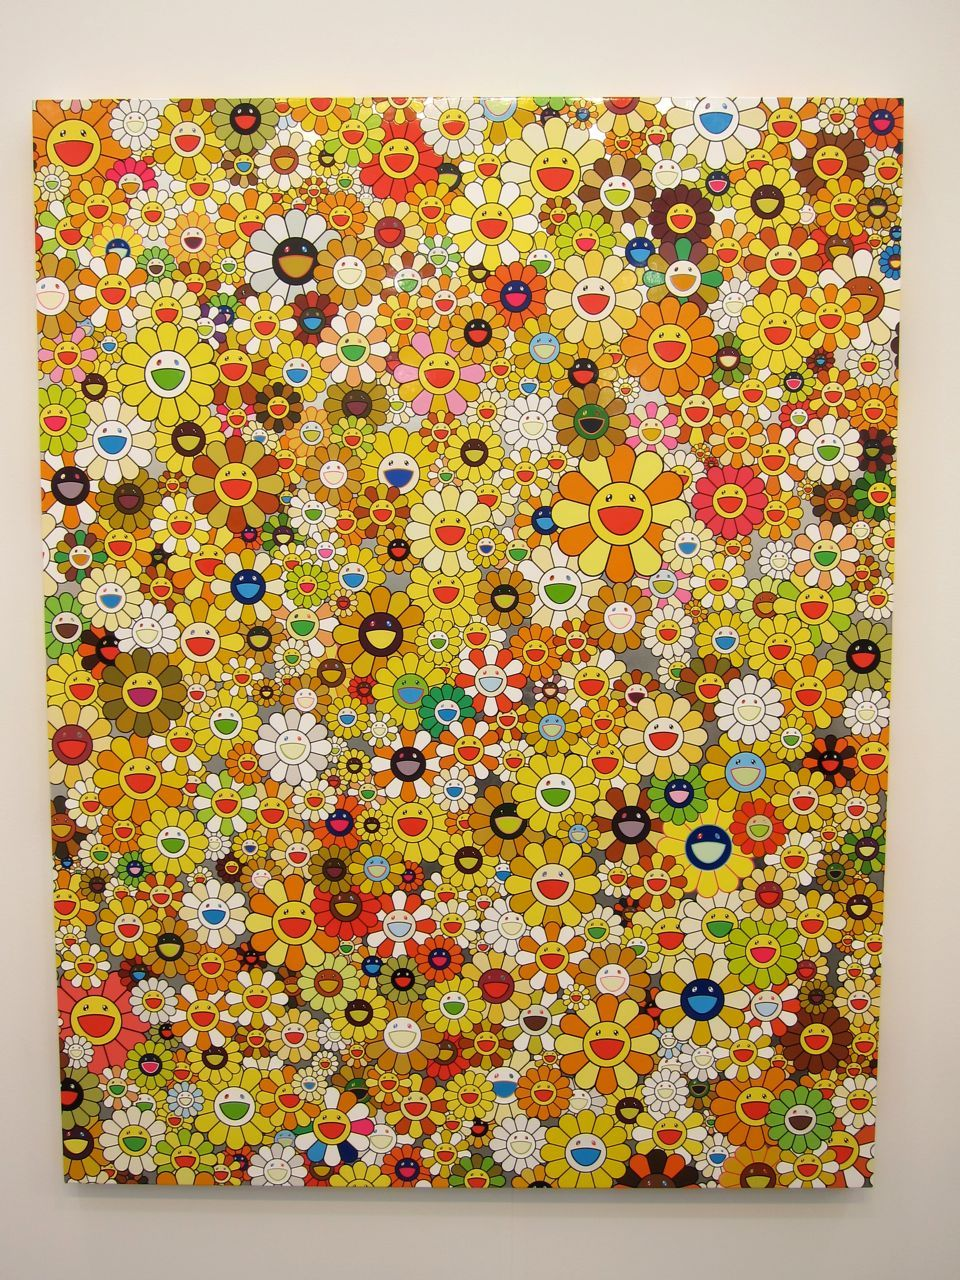 Frieze Week NYC | Wall | Pinterest | Takashi murakami, Frieze art ...